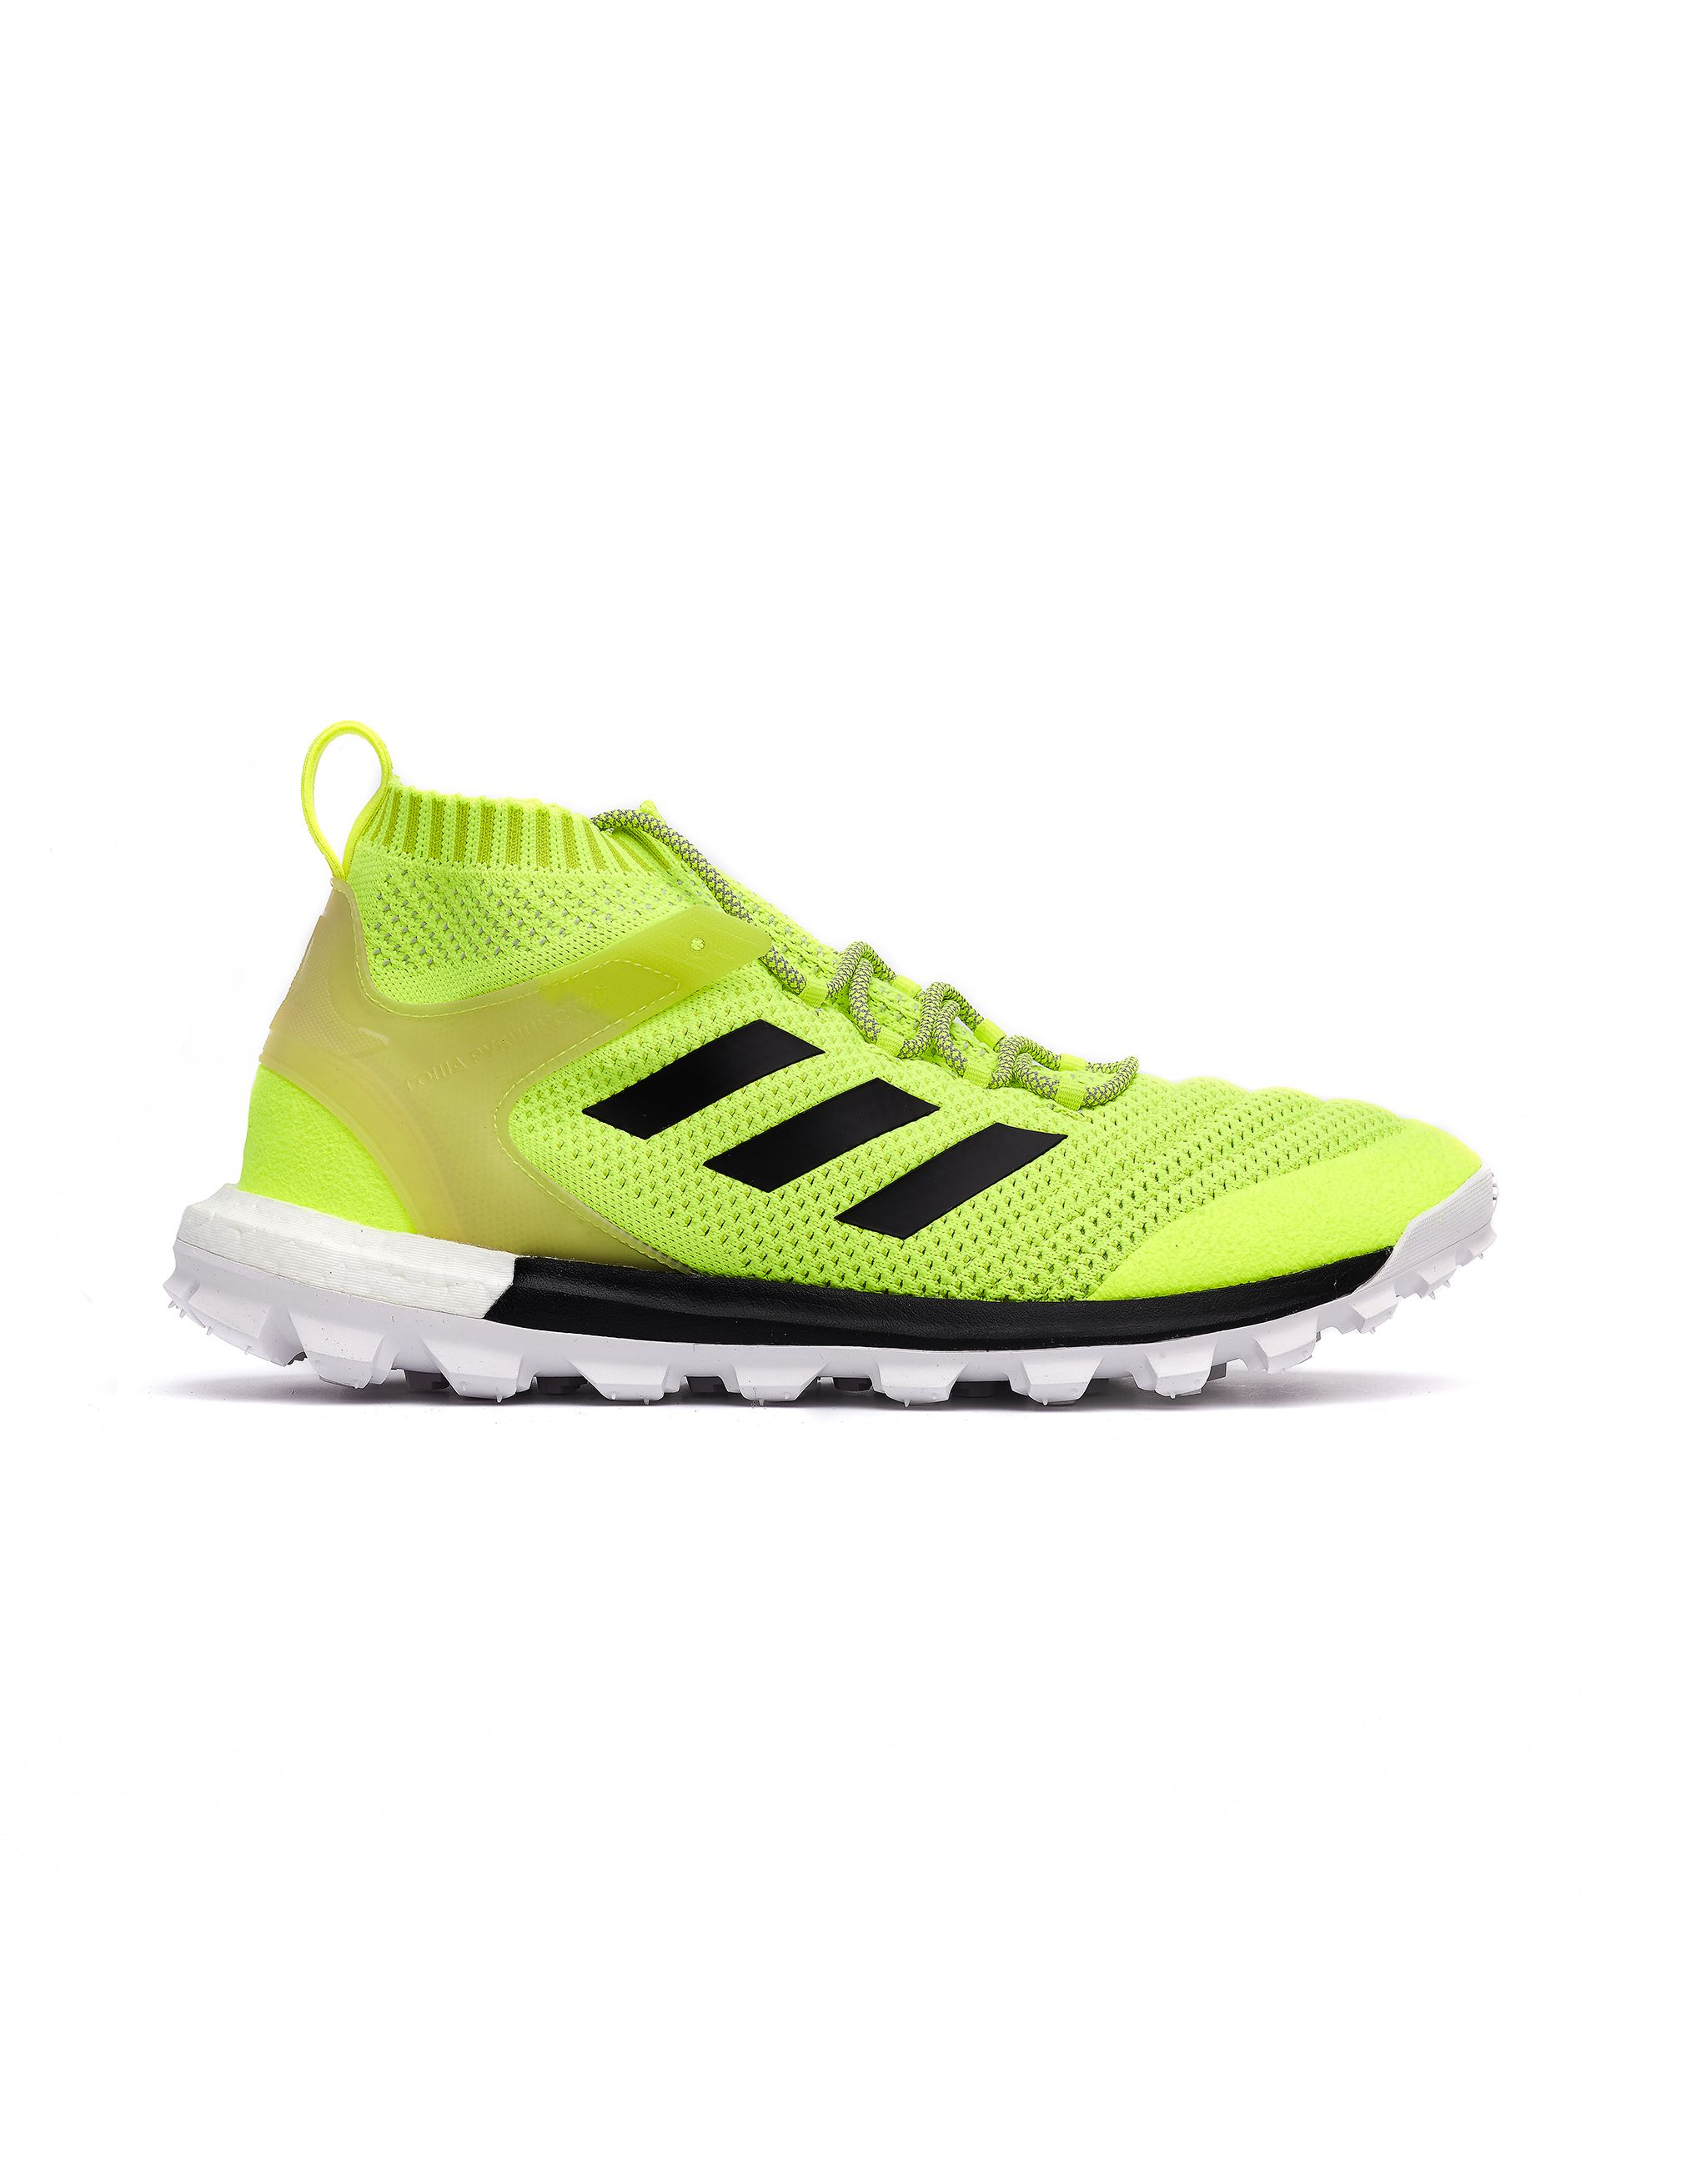 Gosha Rubchinskiy Neon Green Copa Mid Sneakers | Sneakers